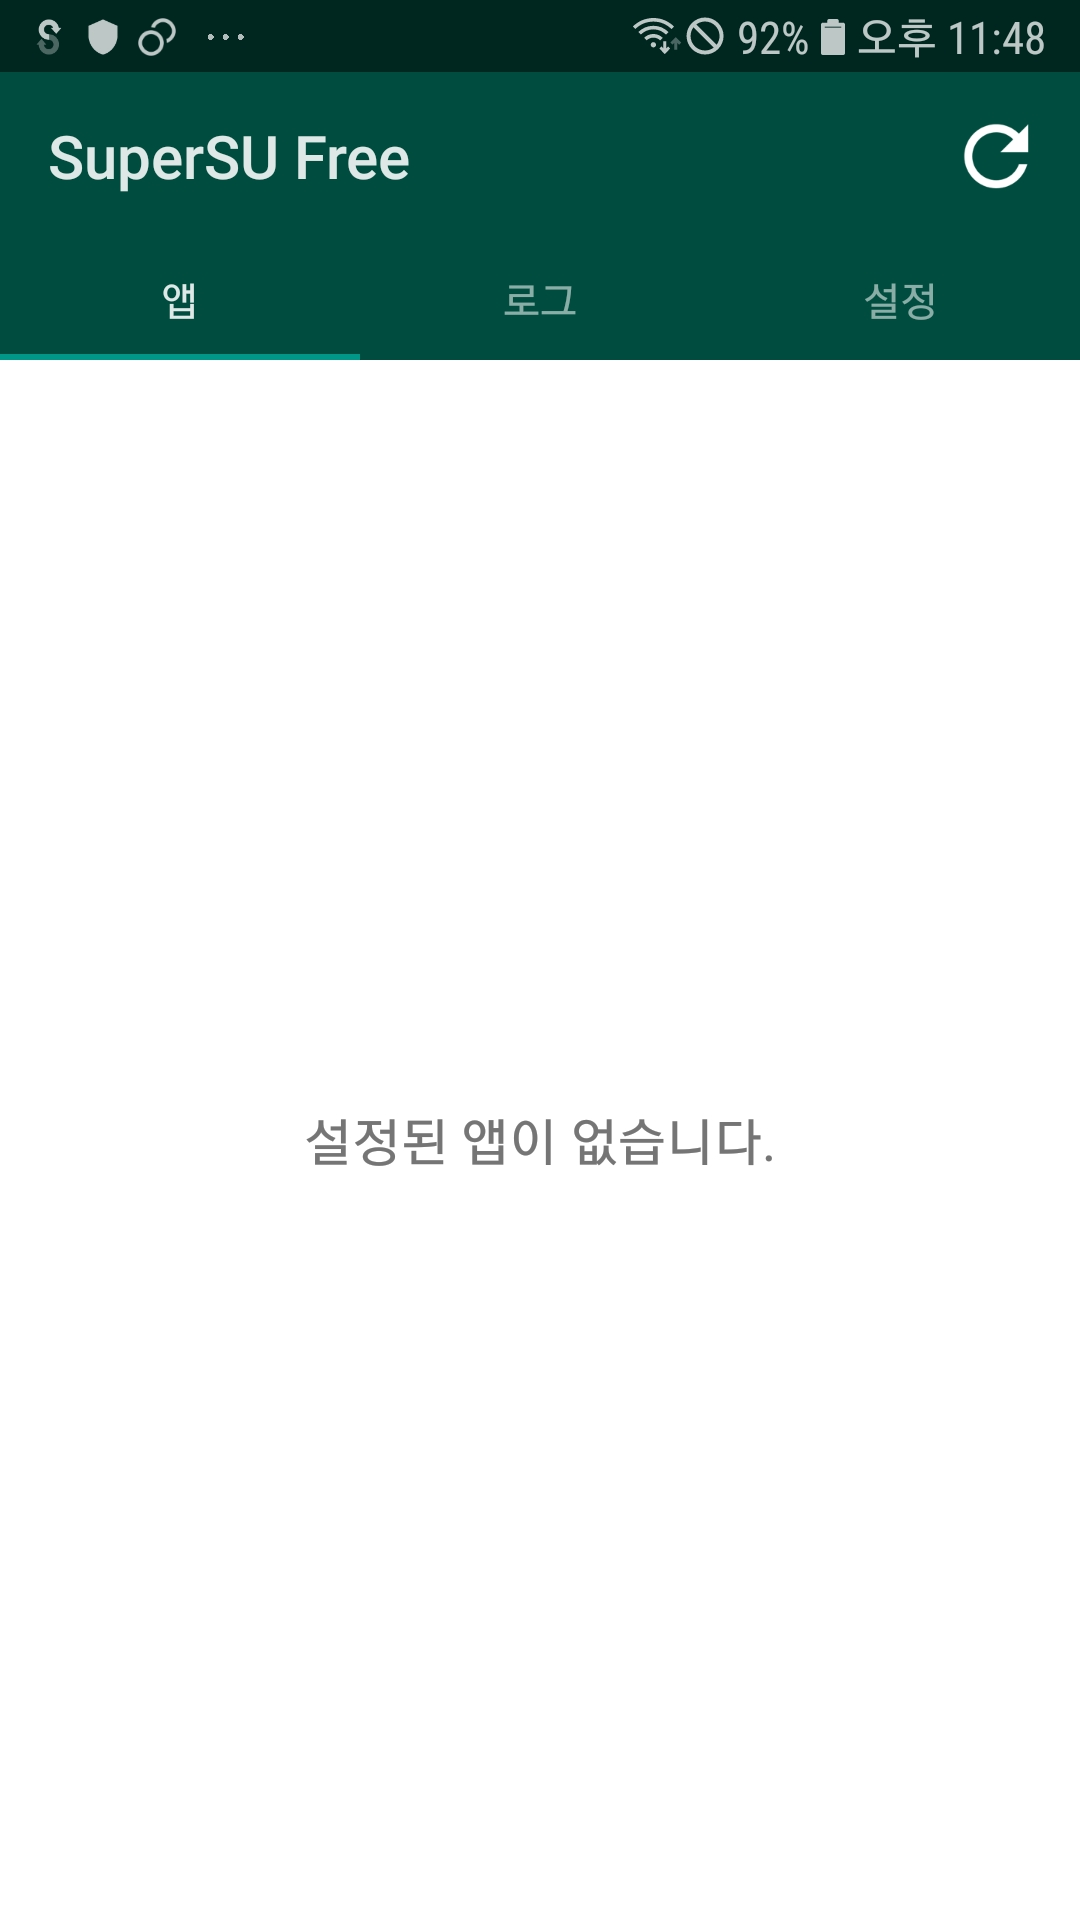 Screenshot_20200114-234843_SuperSU.jpg